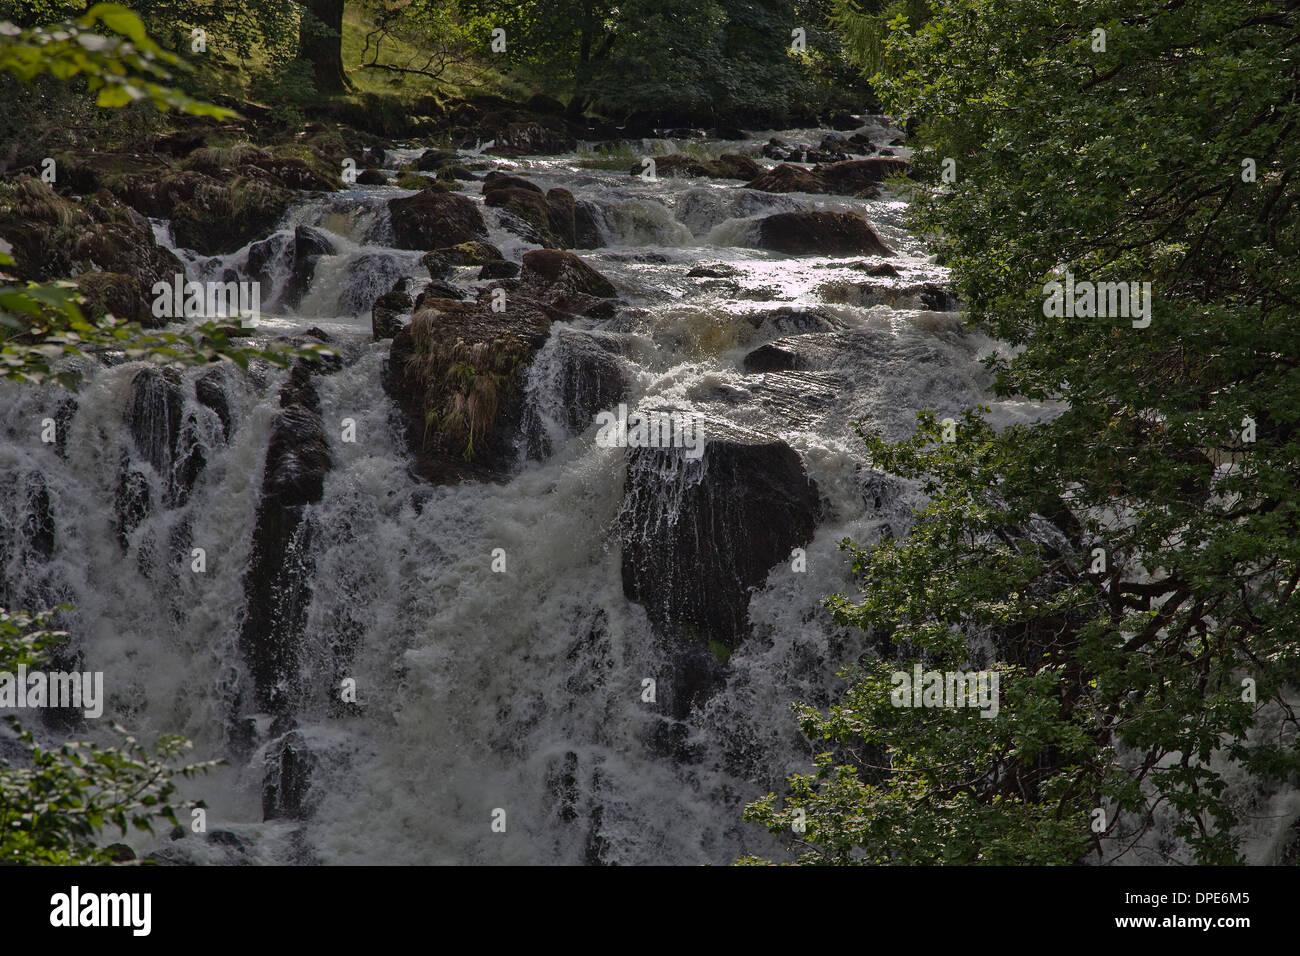 Swallow falls, river Conway Betws-y-Coed, north Wales,GB. - Stock Image